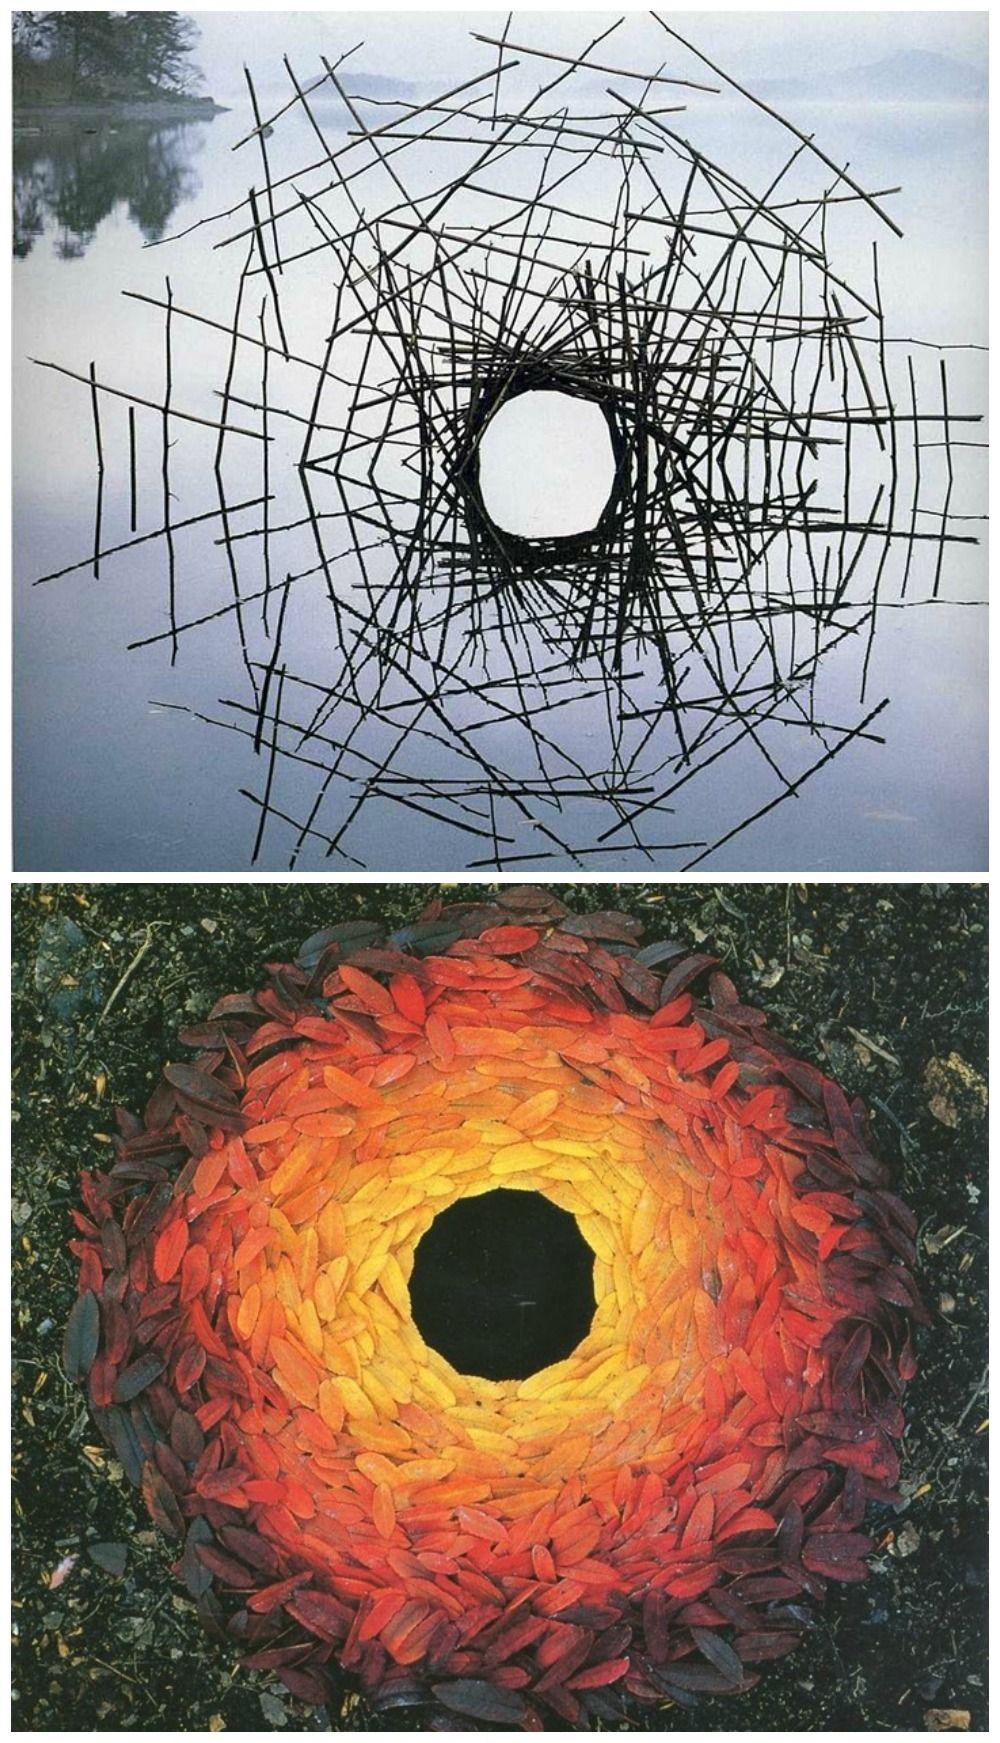 Nature Art: 13 Amazing Environmental Installation Artists #artinstallation